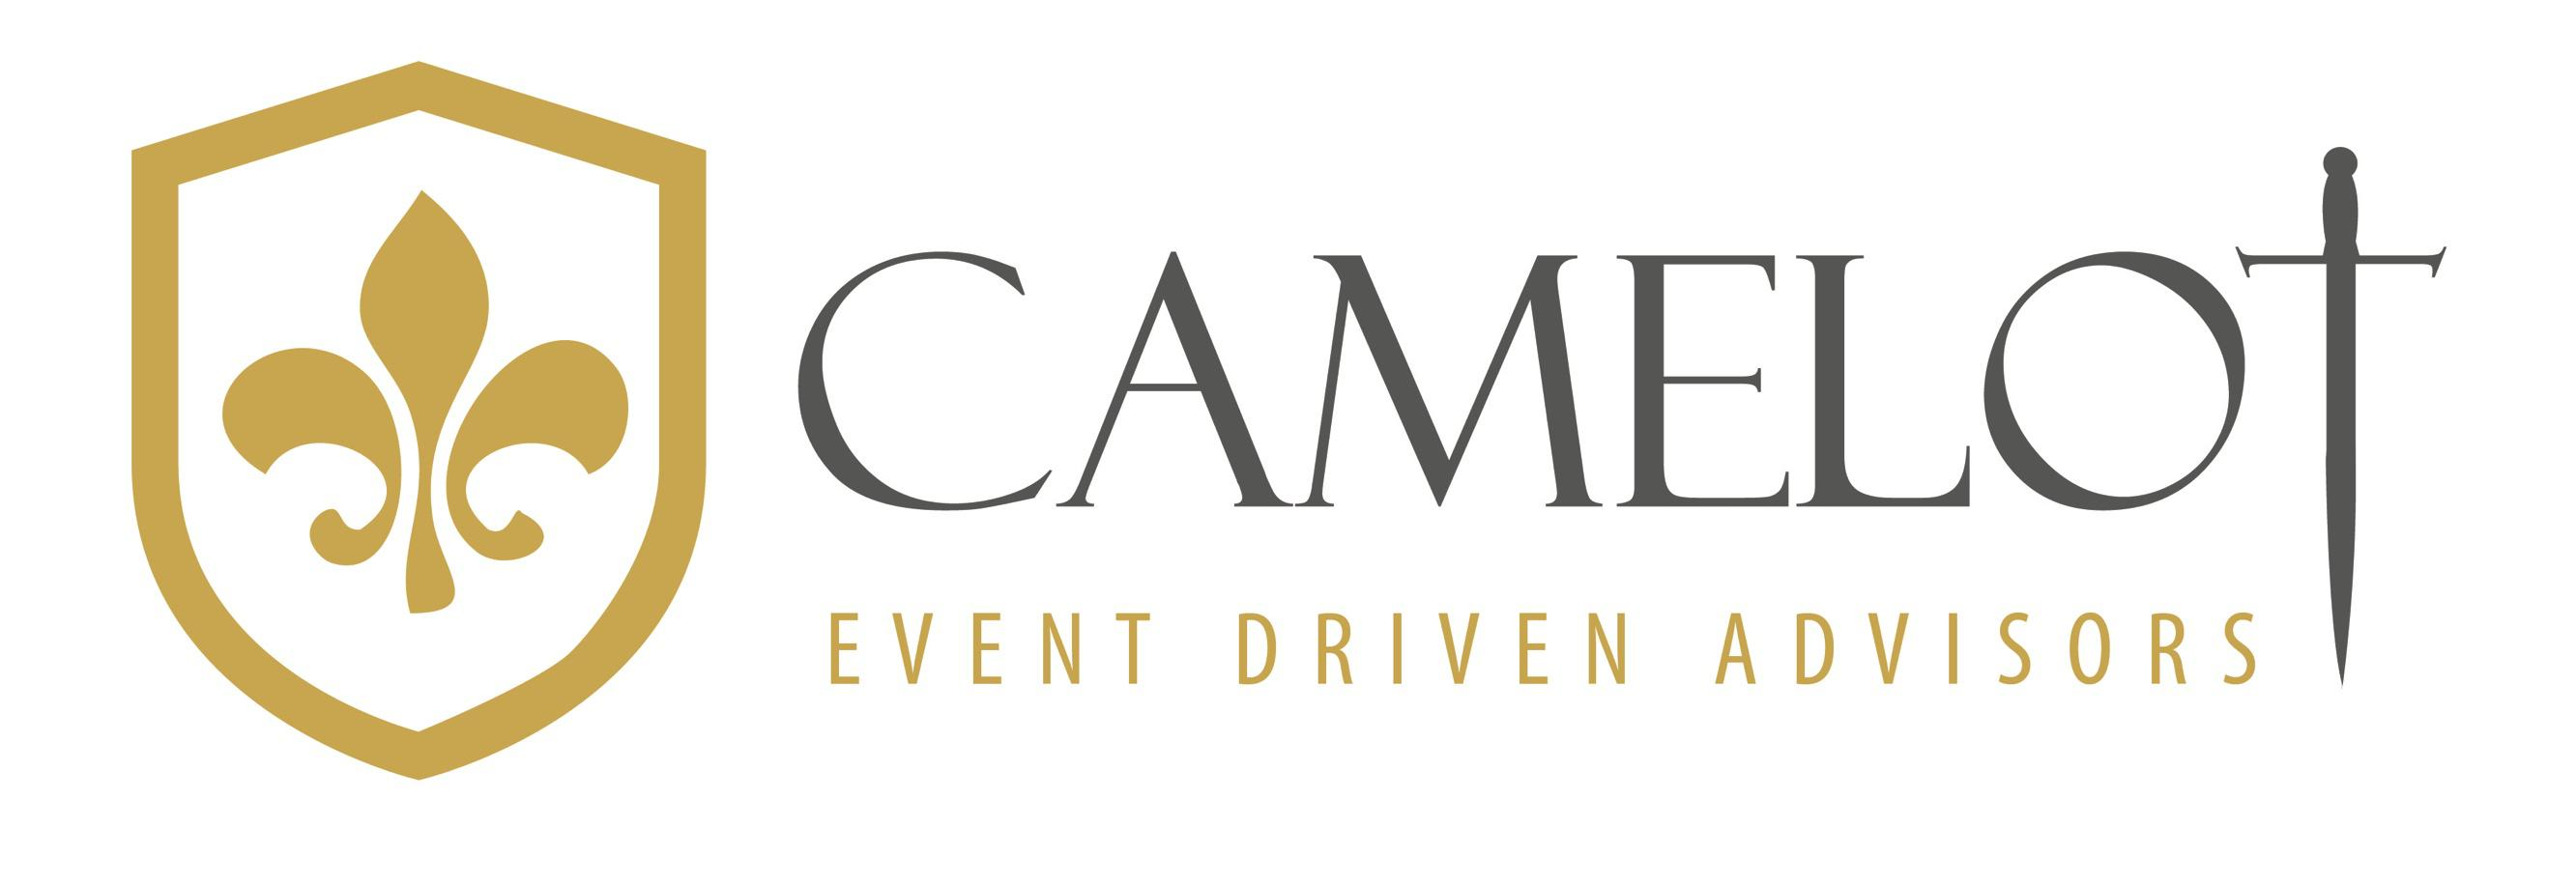 Camelot EventDriven Advisors